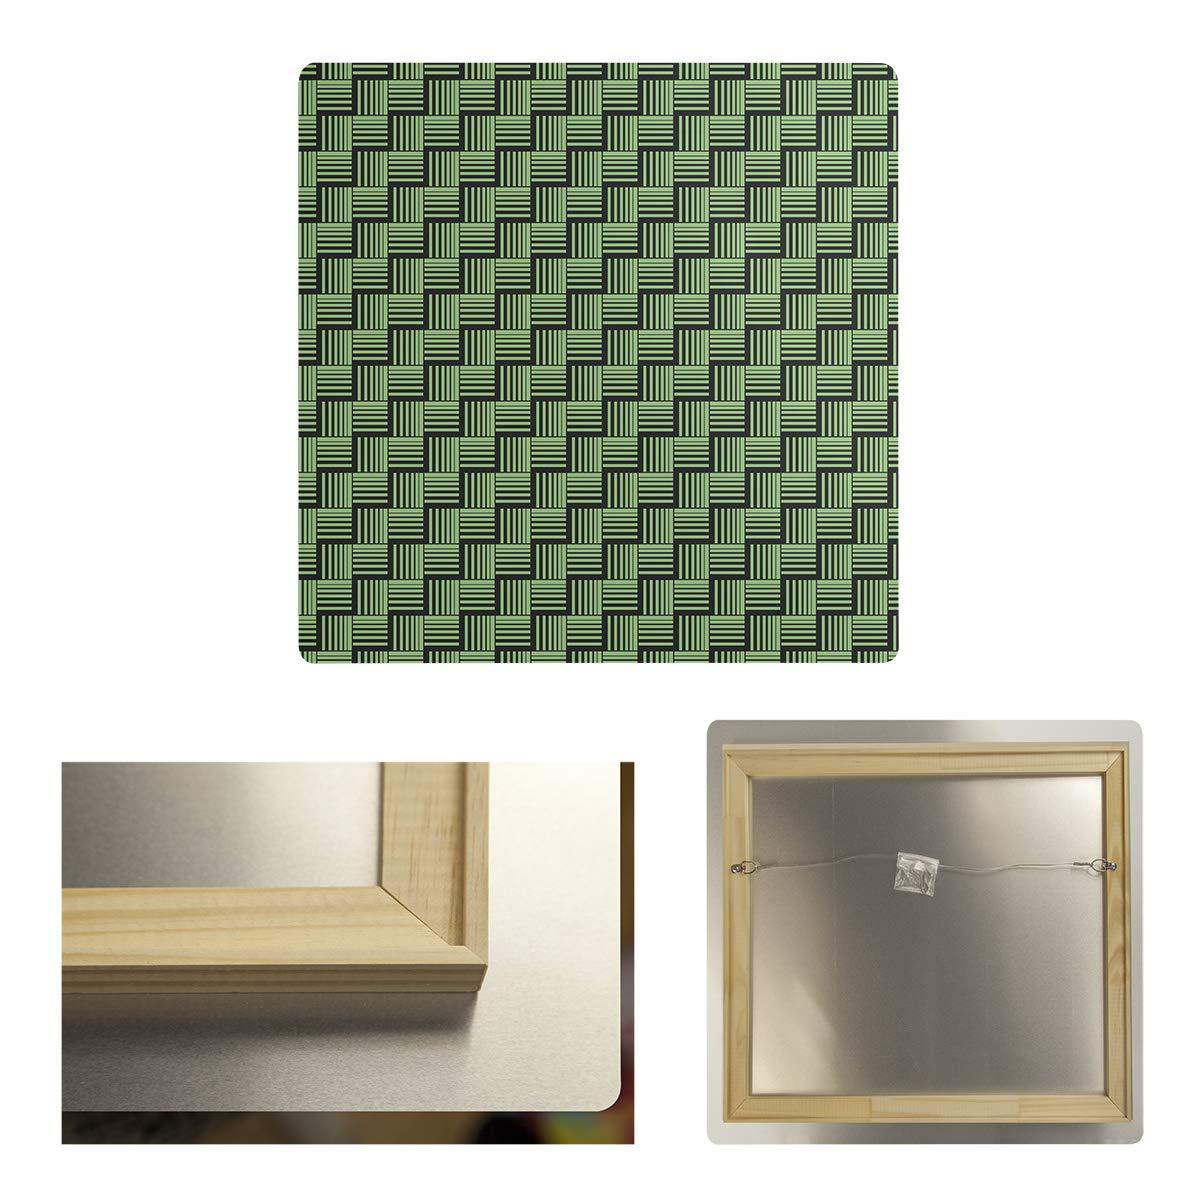 ArtVerse STR077-MA3232 Dana Strider Black Contrast Basketweave Stripes Metal Print 32 x 32 Green